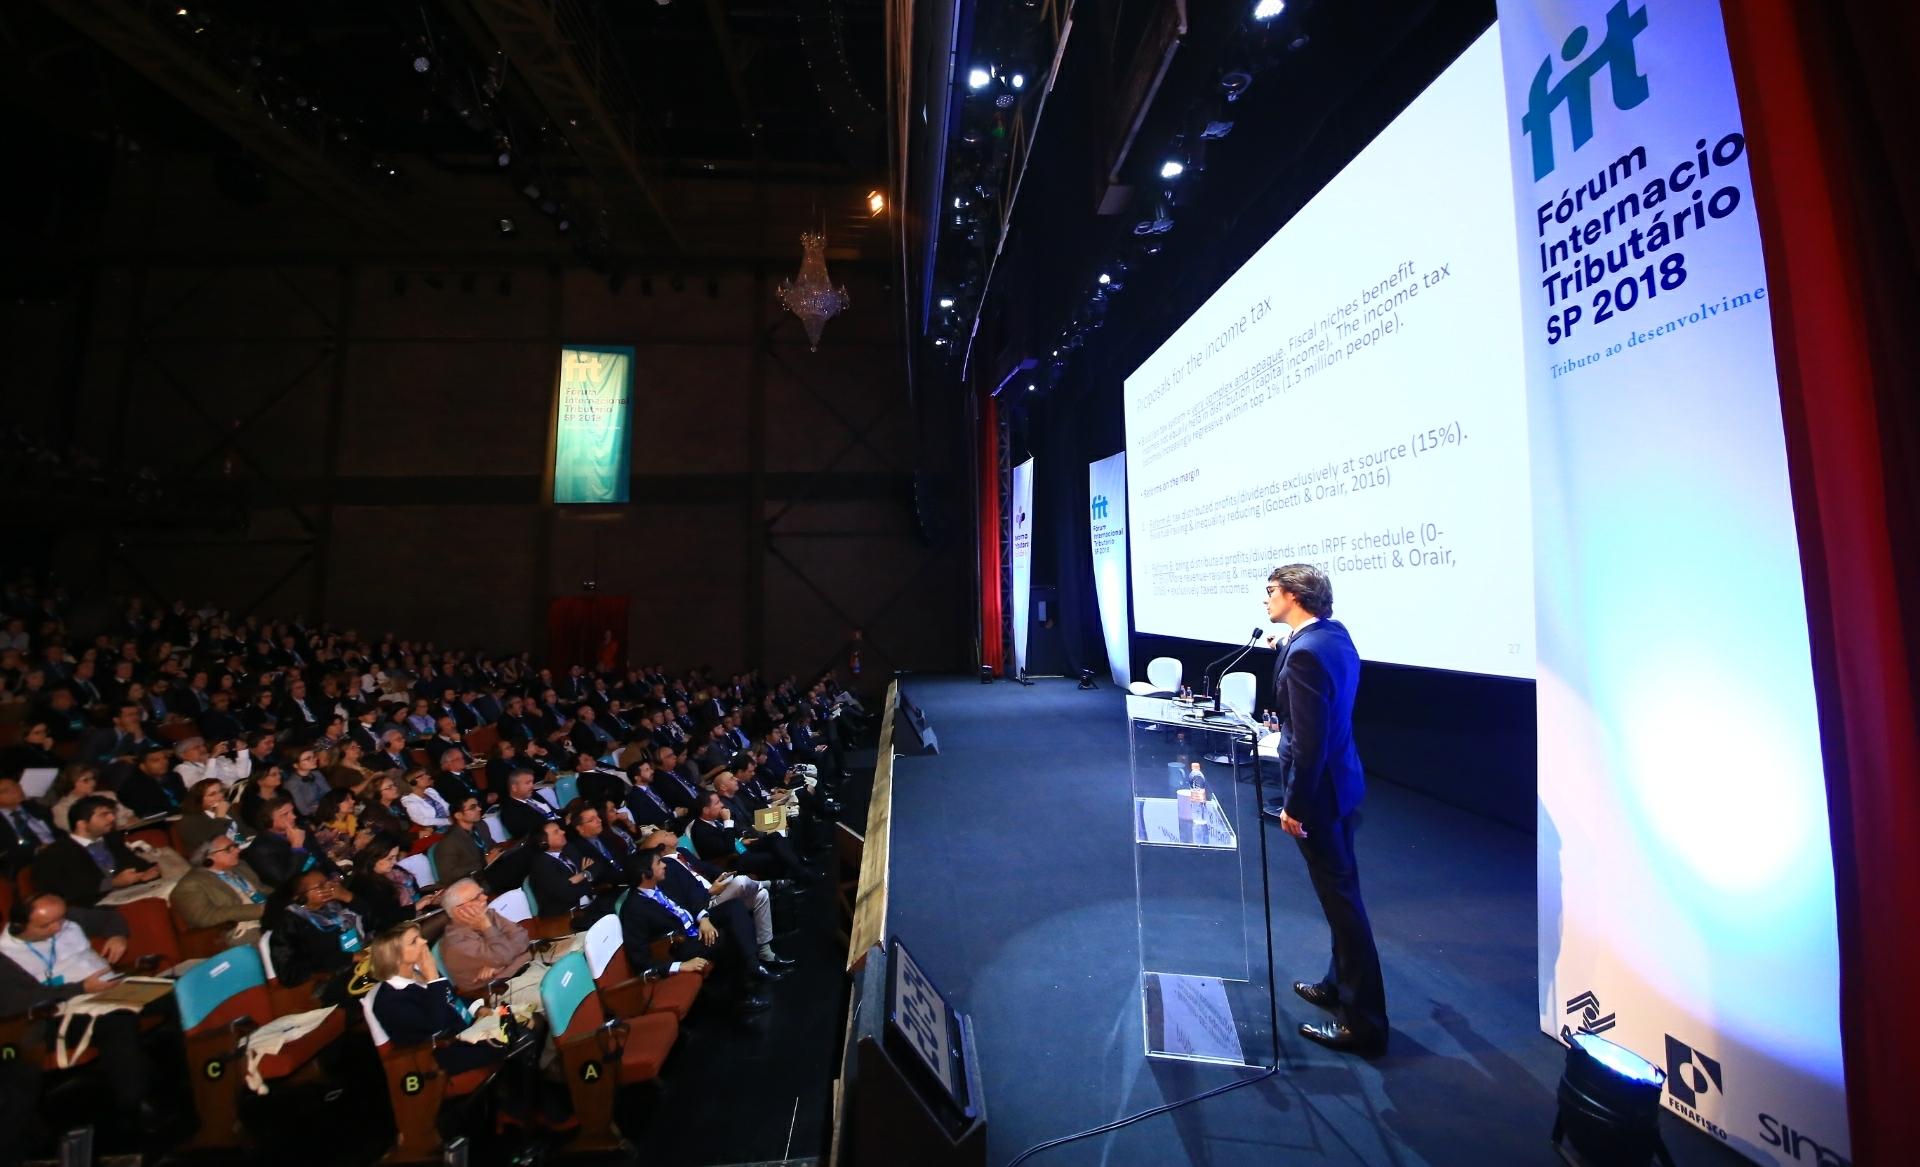 ASBIN presente no Fórum Internacional Tributário 2018